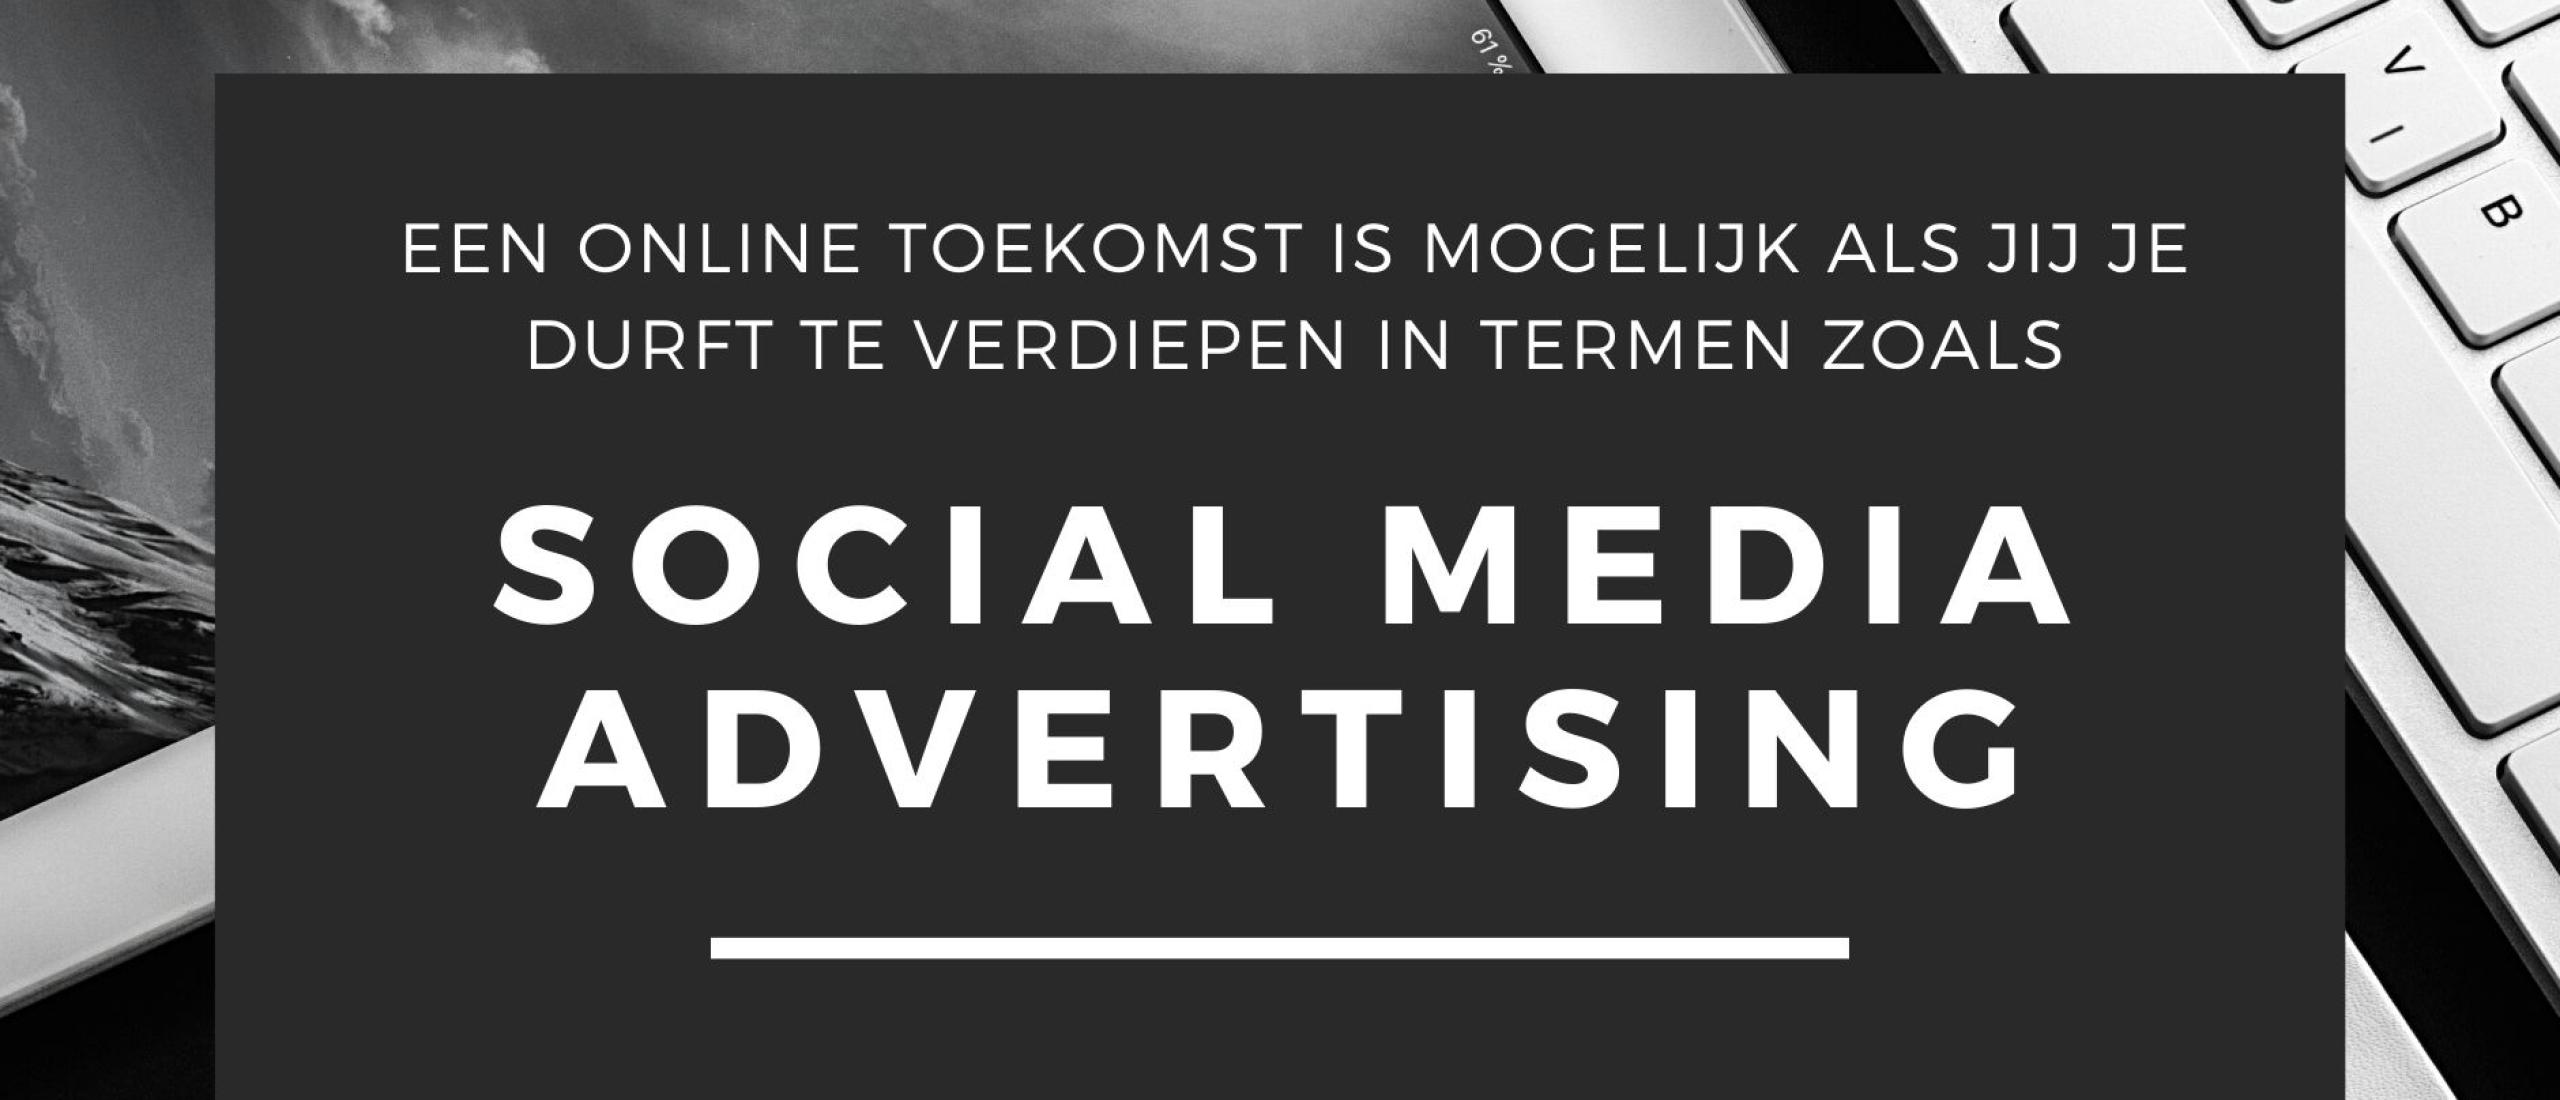 Cursus Social Media Adverteren